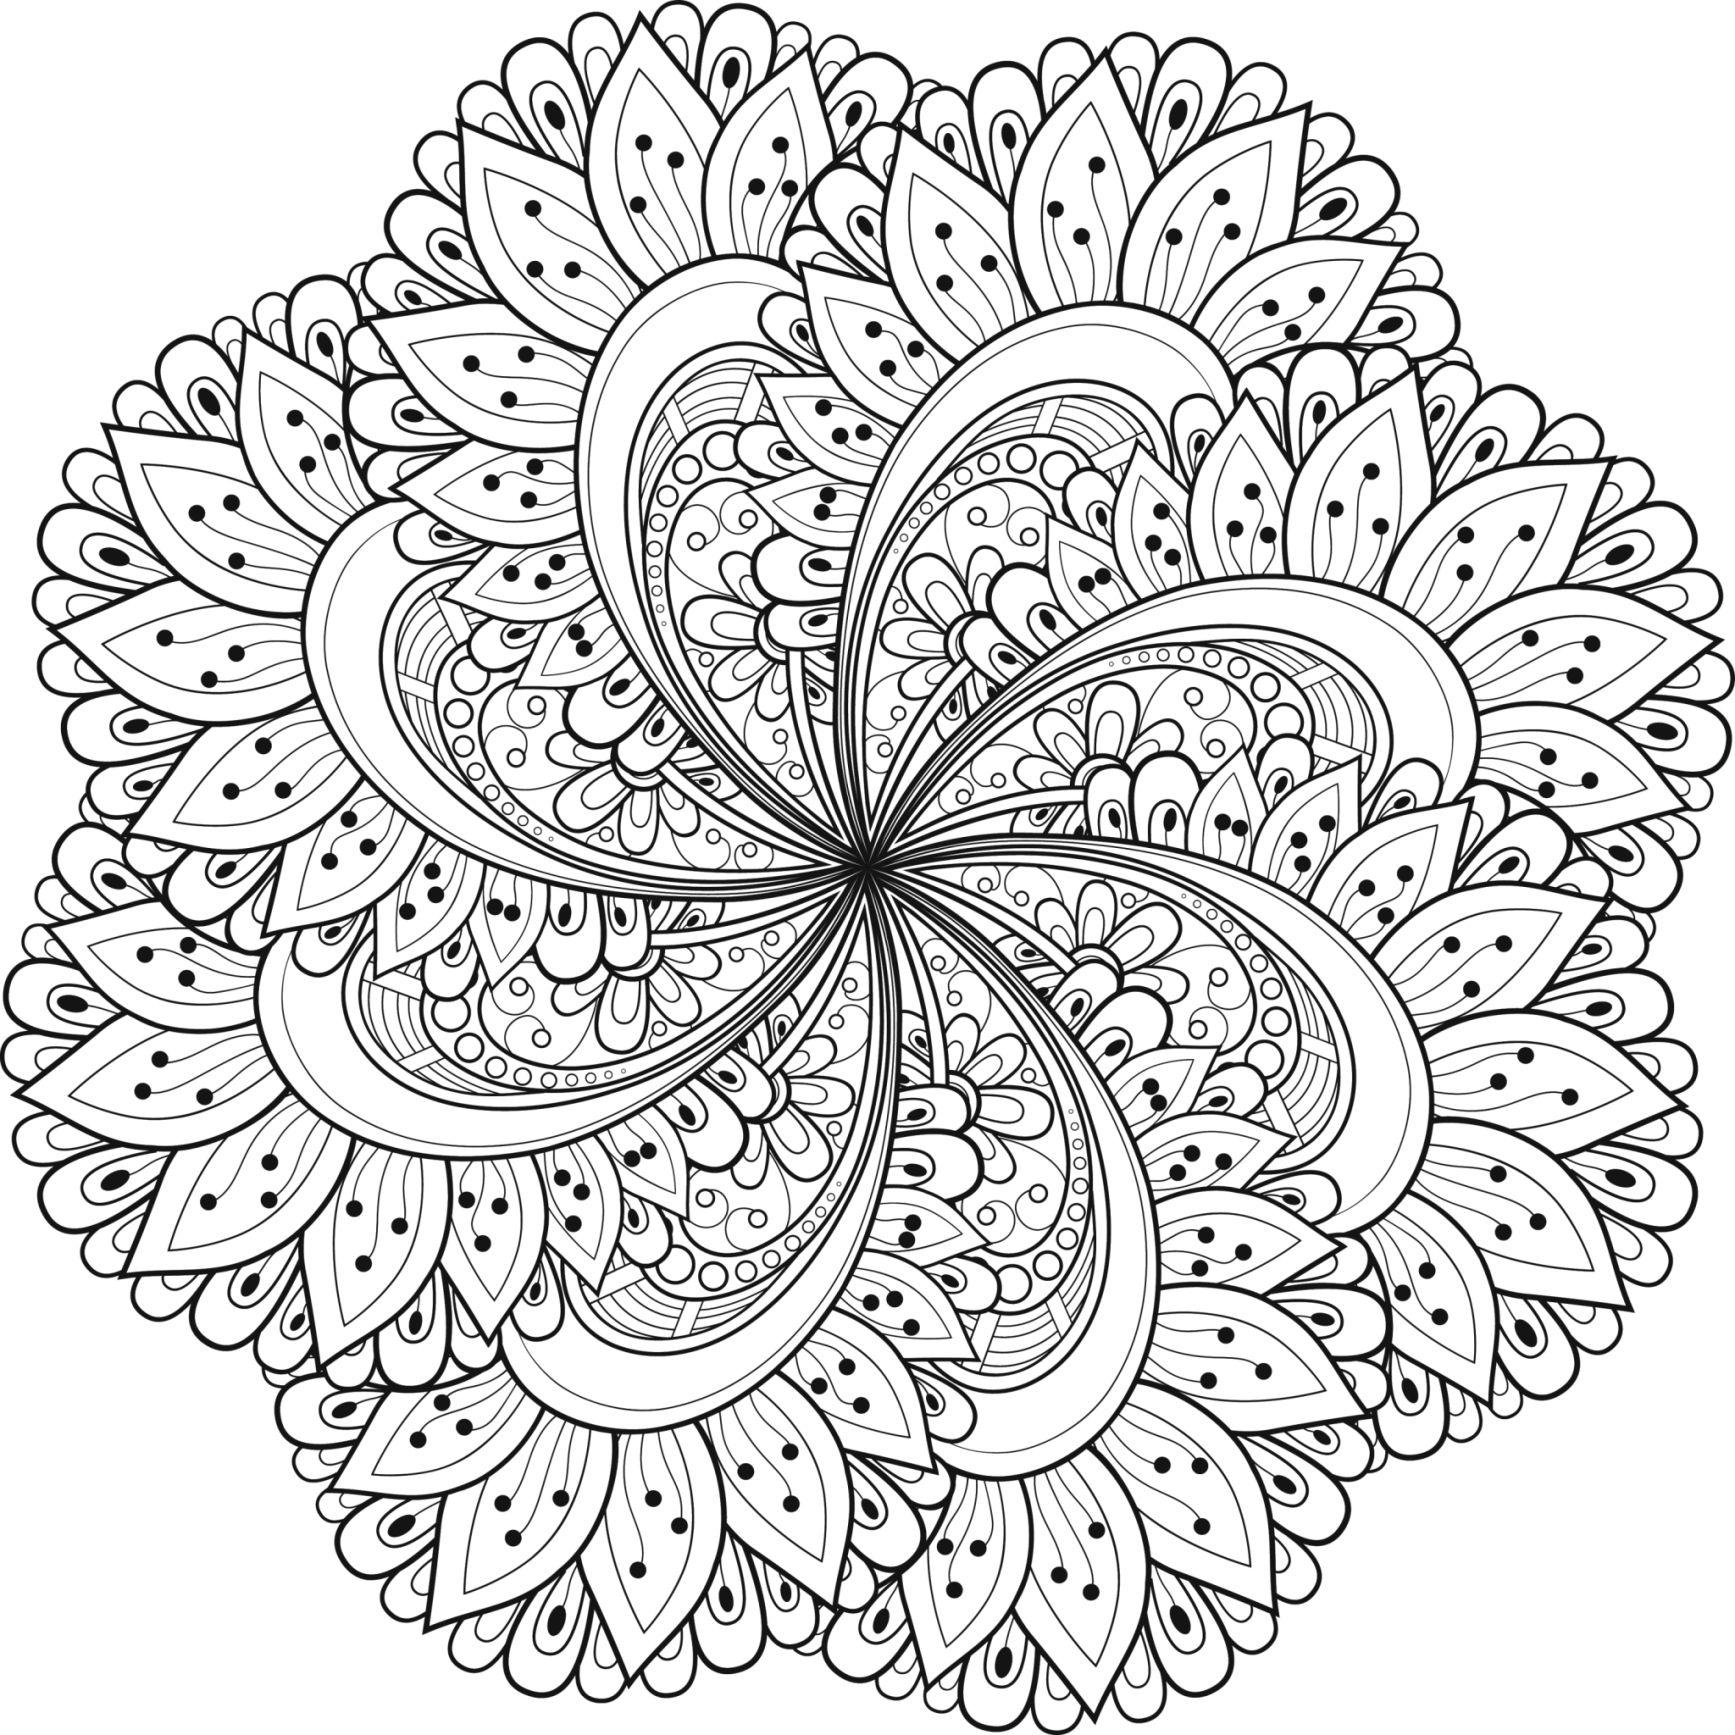 Mandalas | COLORING PAGES | Mandala coloring, Mandala coloring